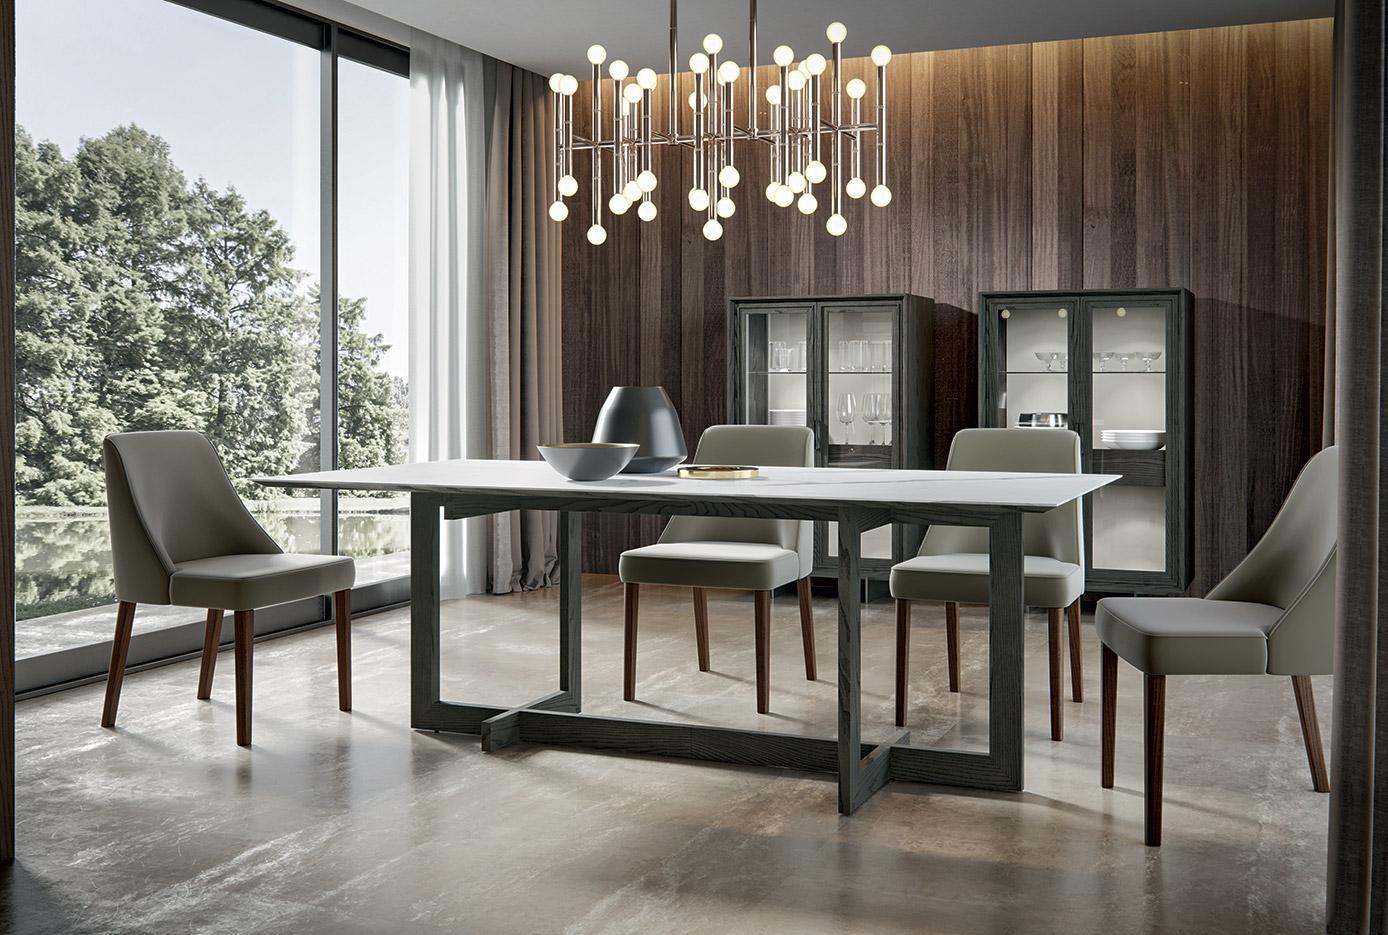 Tavoli e sedie zenith mobilgam for Tavoli design outlet